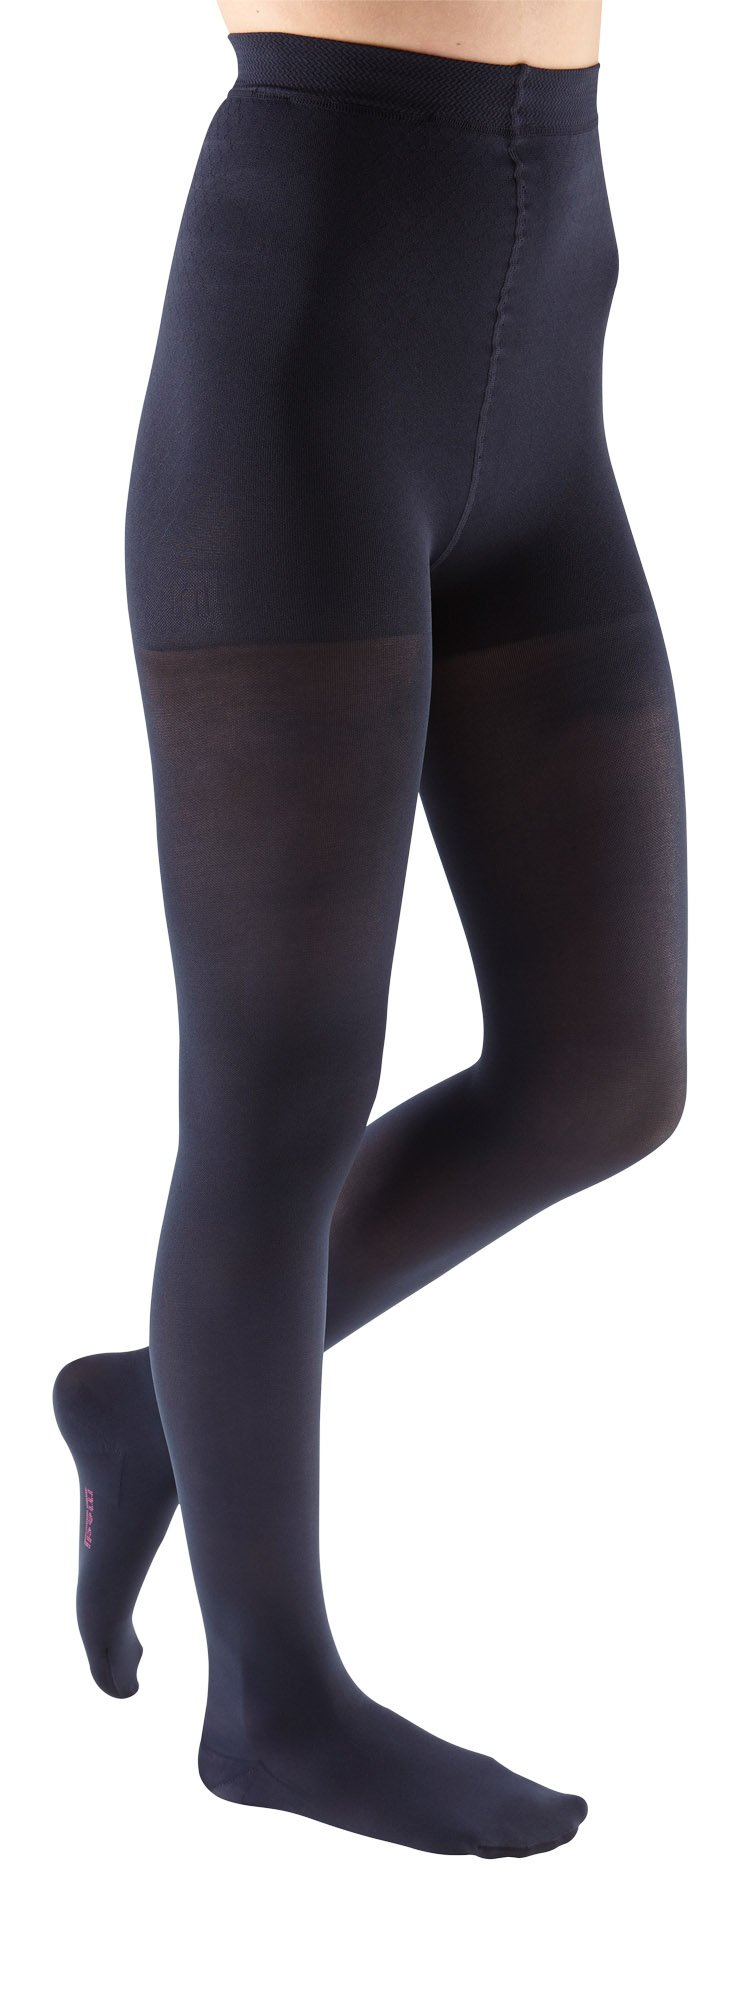 mediven Comfort, 30-40 mmHg, Compression Pantyhose, Closed Toe